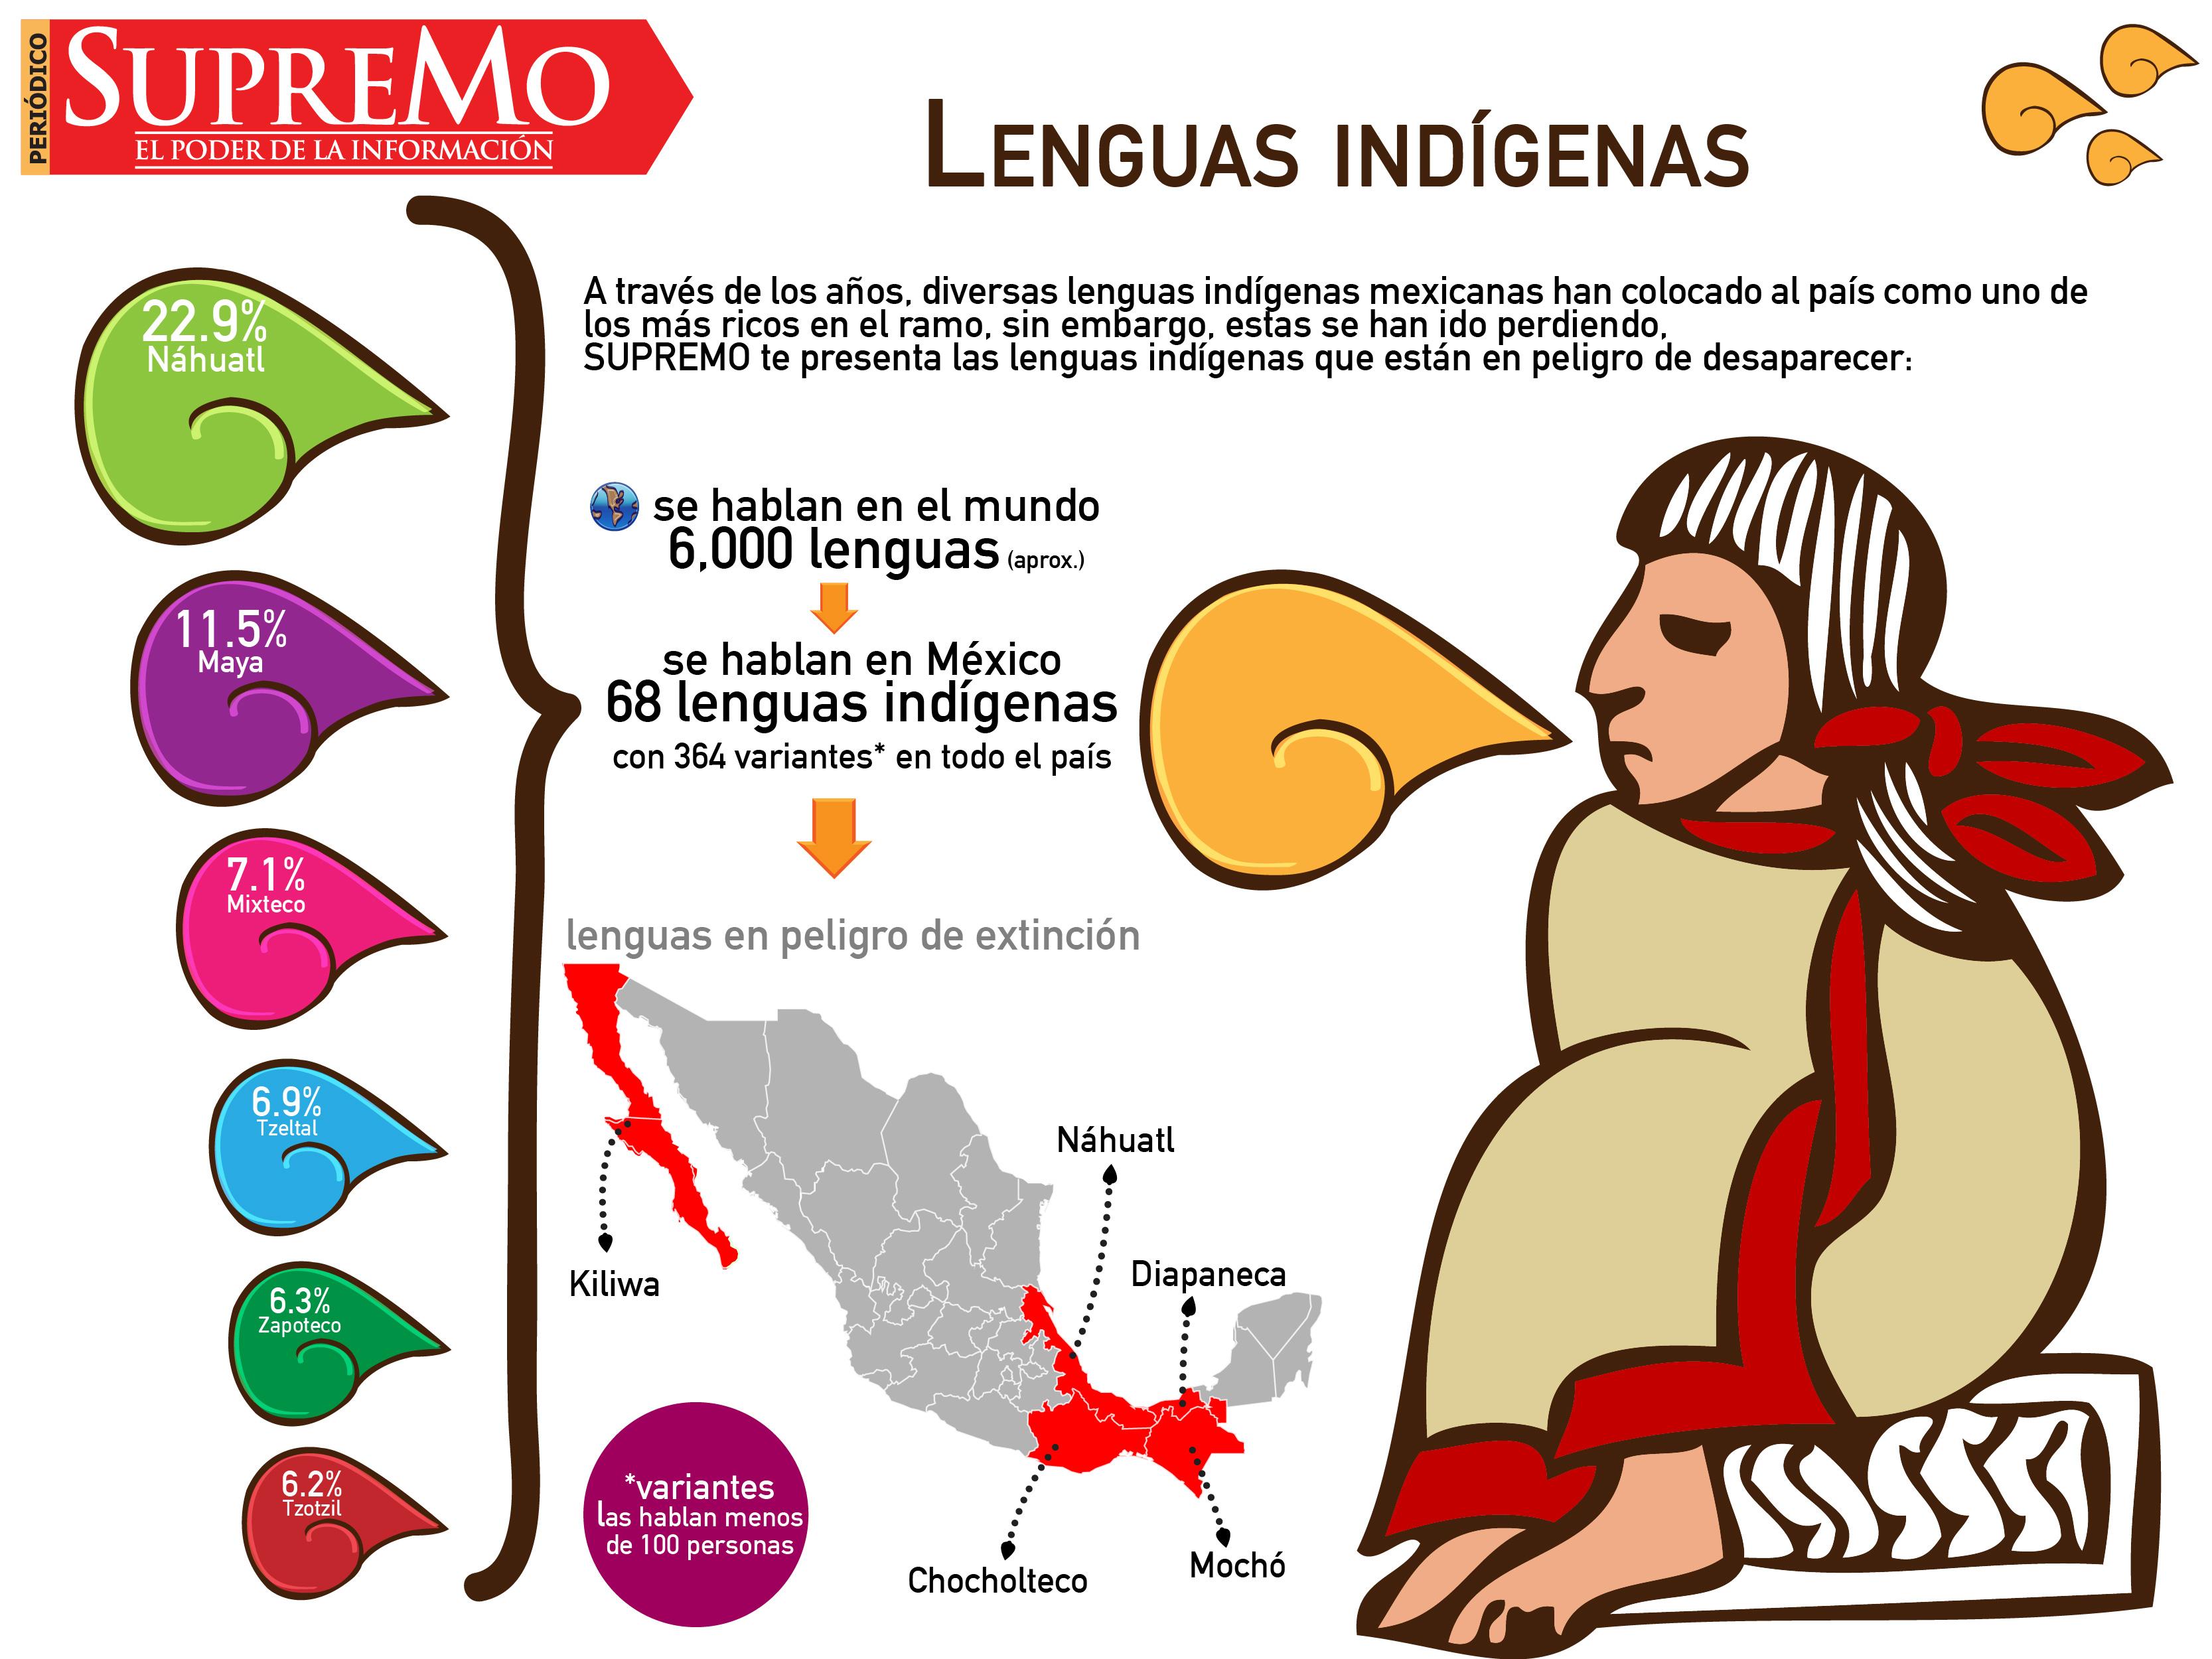 Indiomas nativos